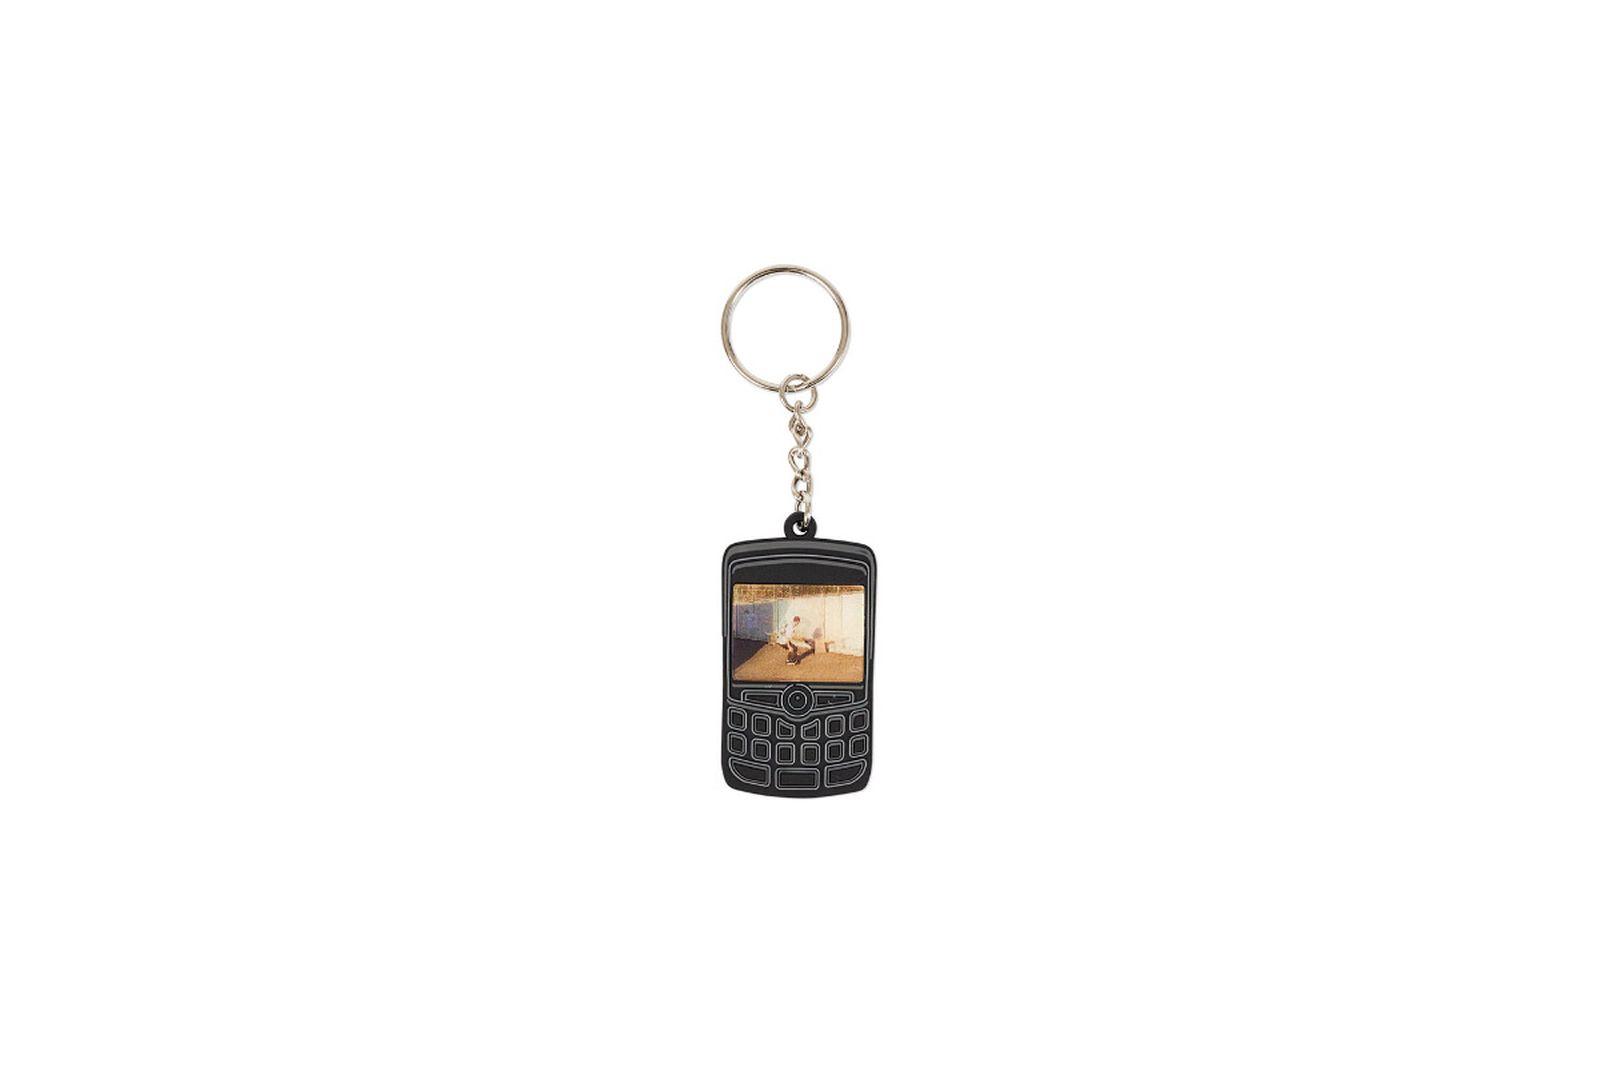 Palace 2019 Autumn Pring blackberry2242